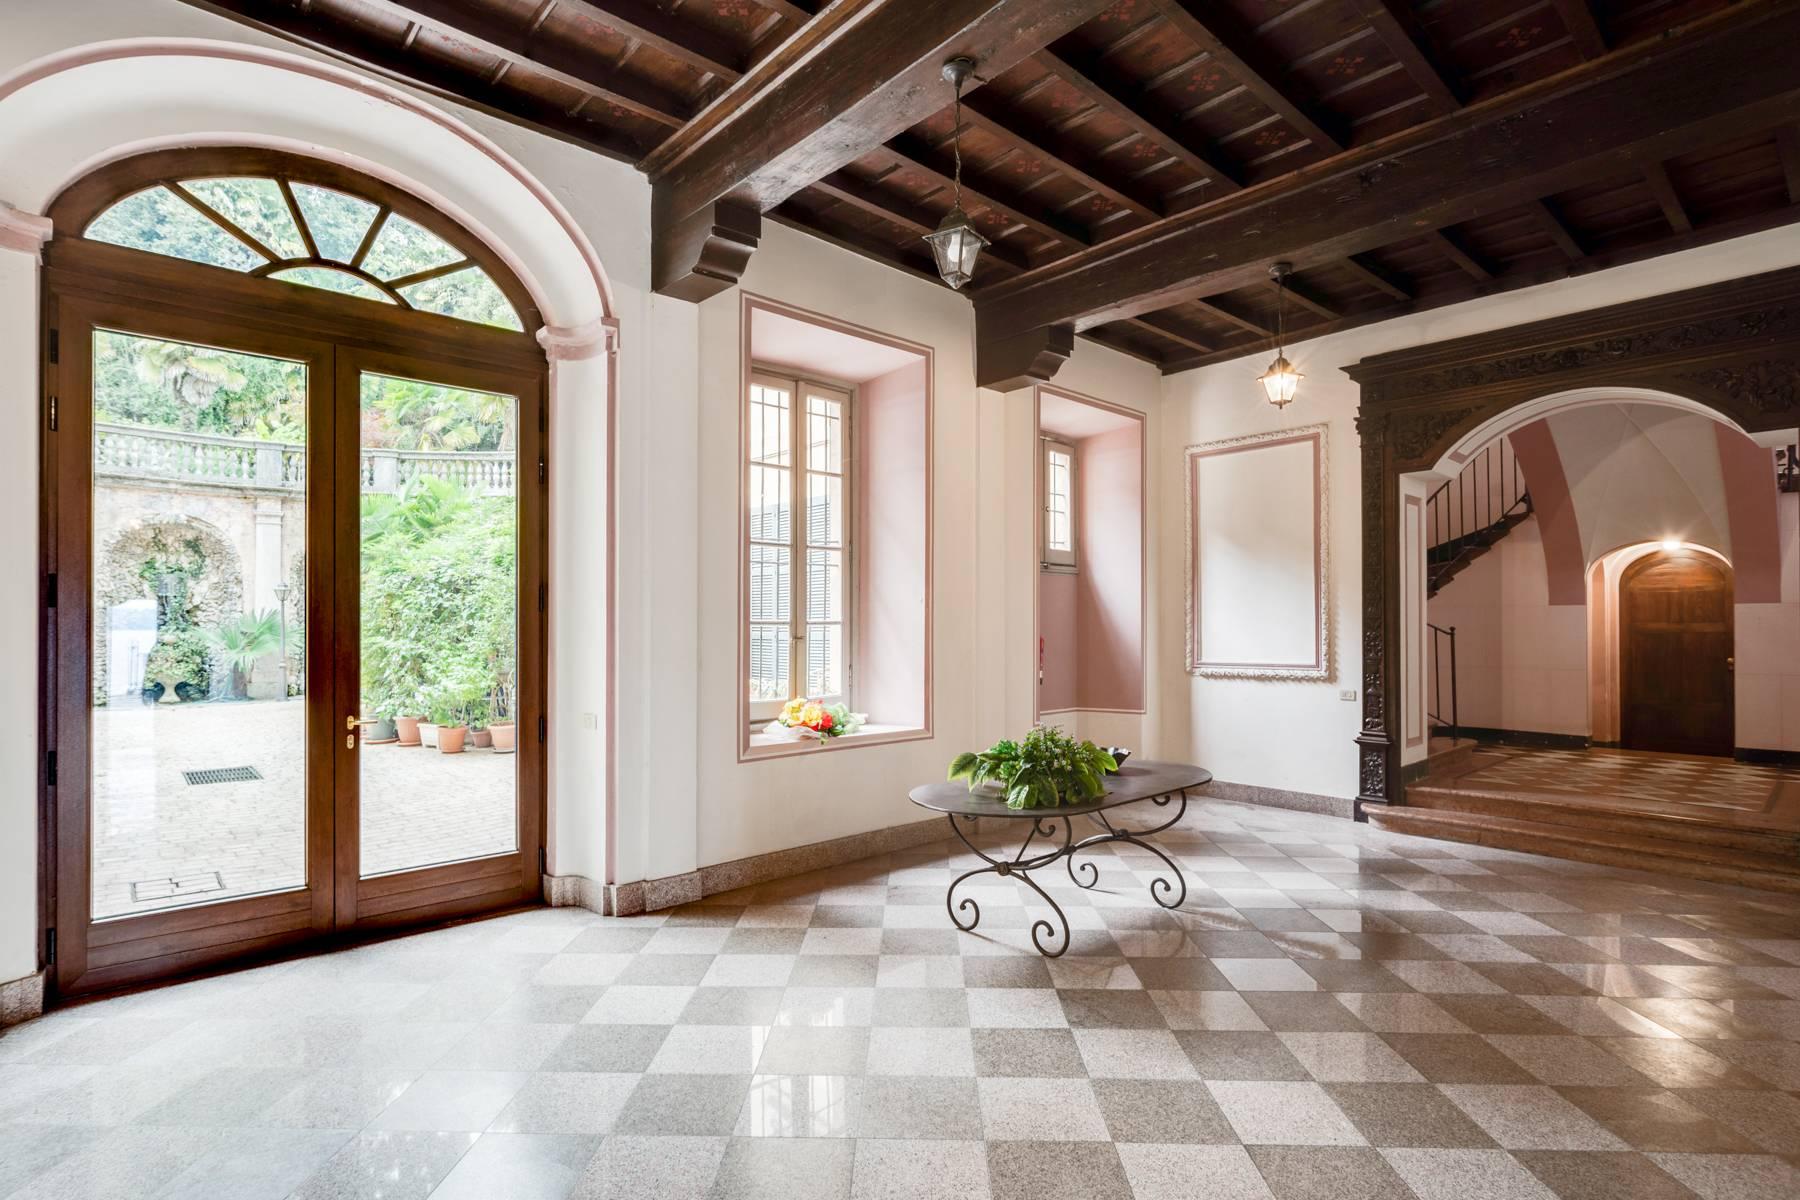 Appartamento in Vendita a Belgirate: 4 locali, 118 mq - Foto 9